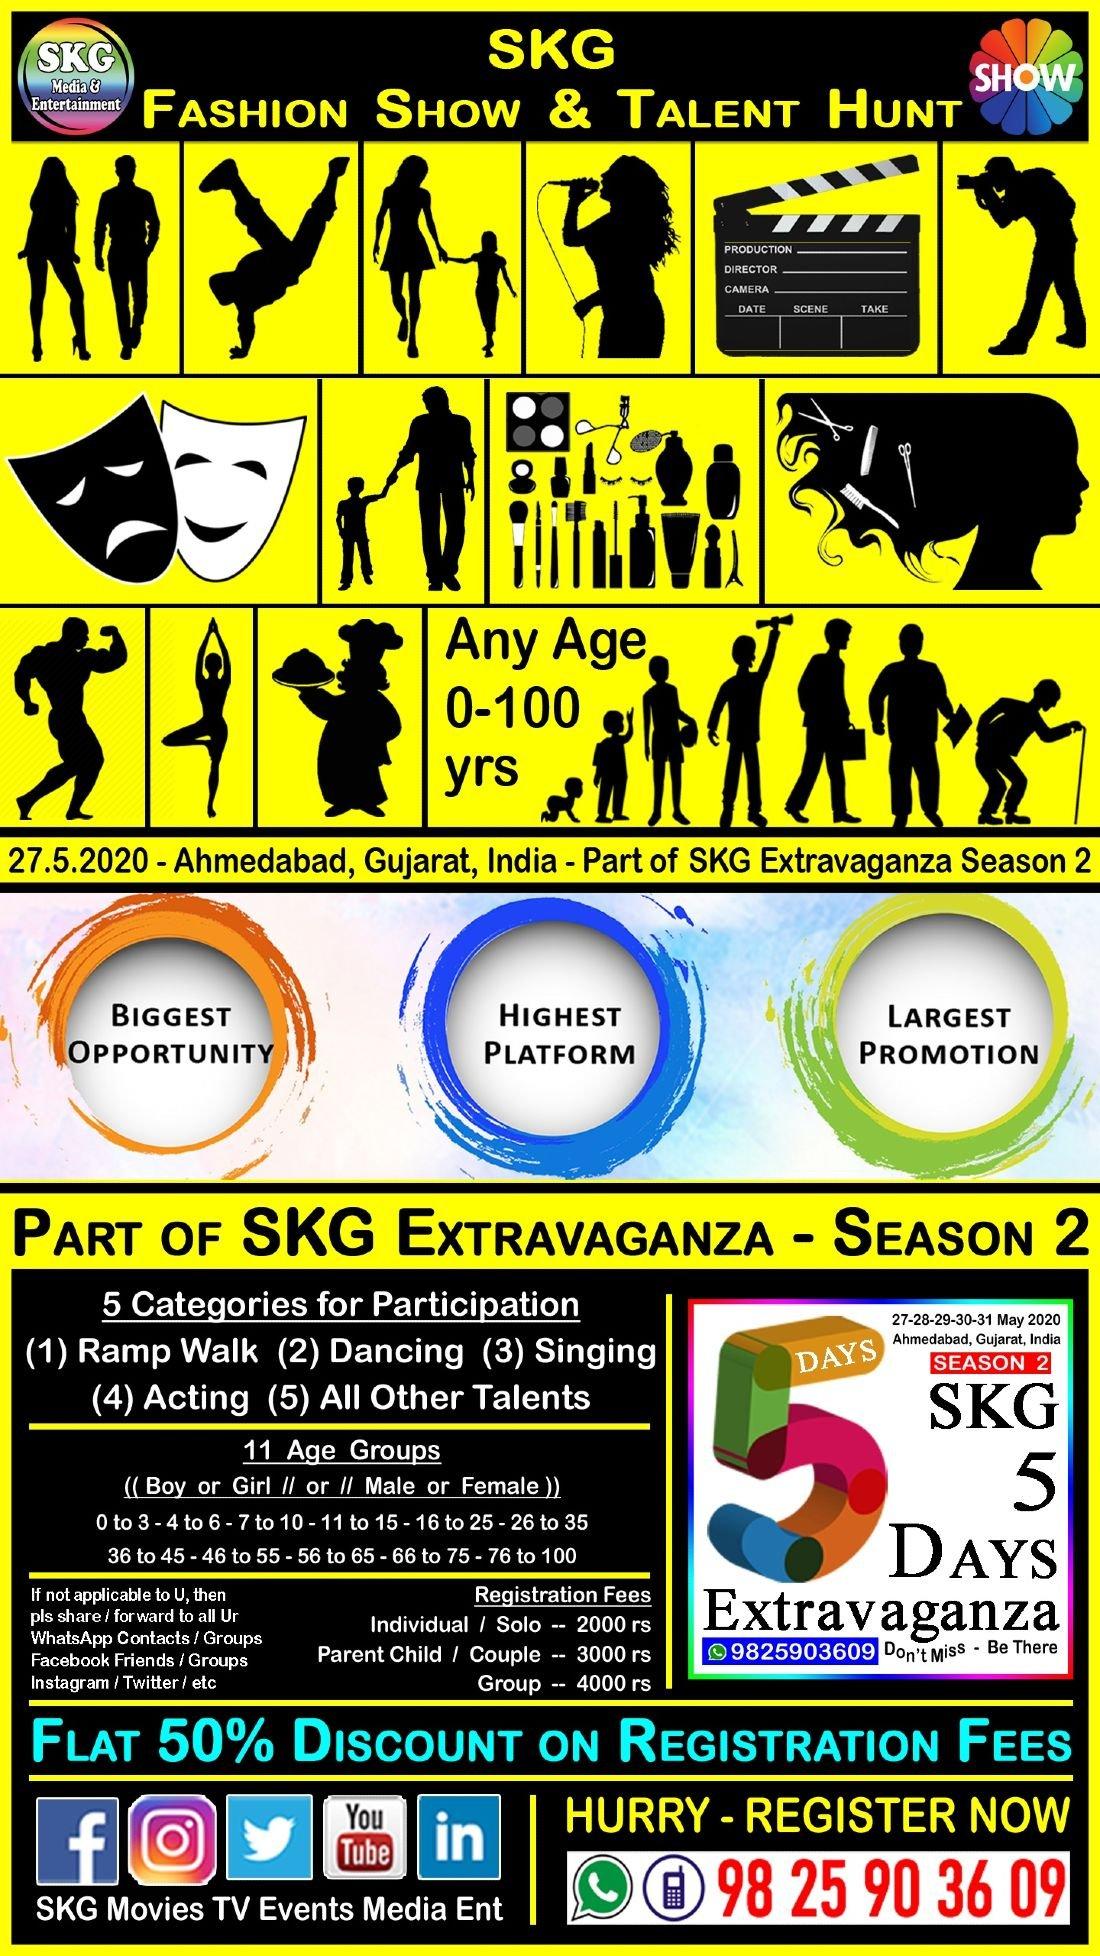 SKG Fashion Show & Talent Hunt - Part of SKG 5 Days Extravaganza - Season 2